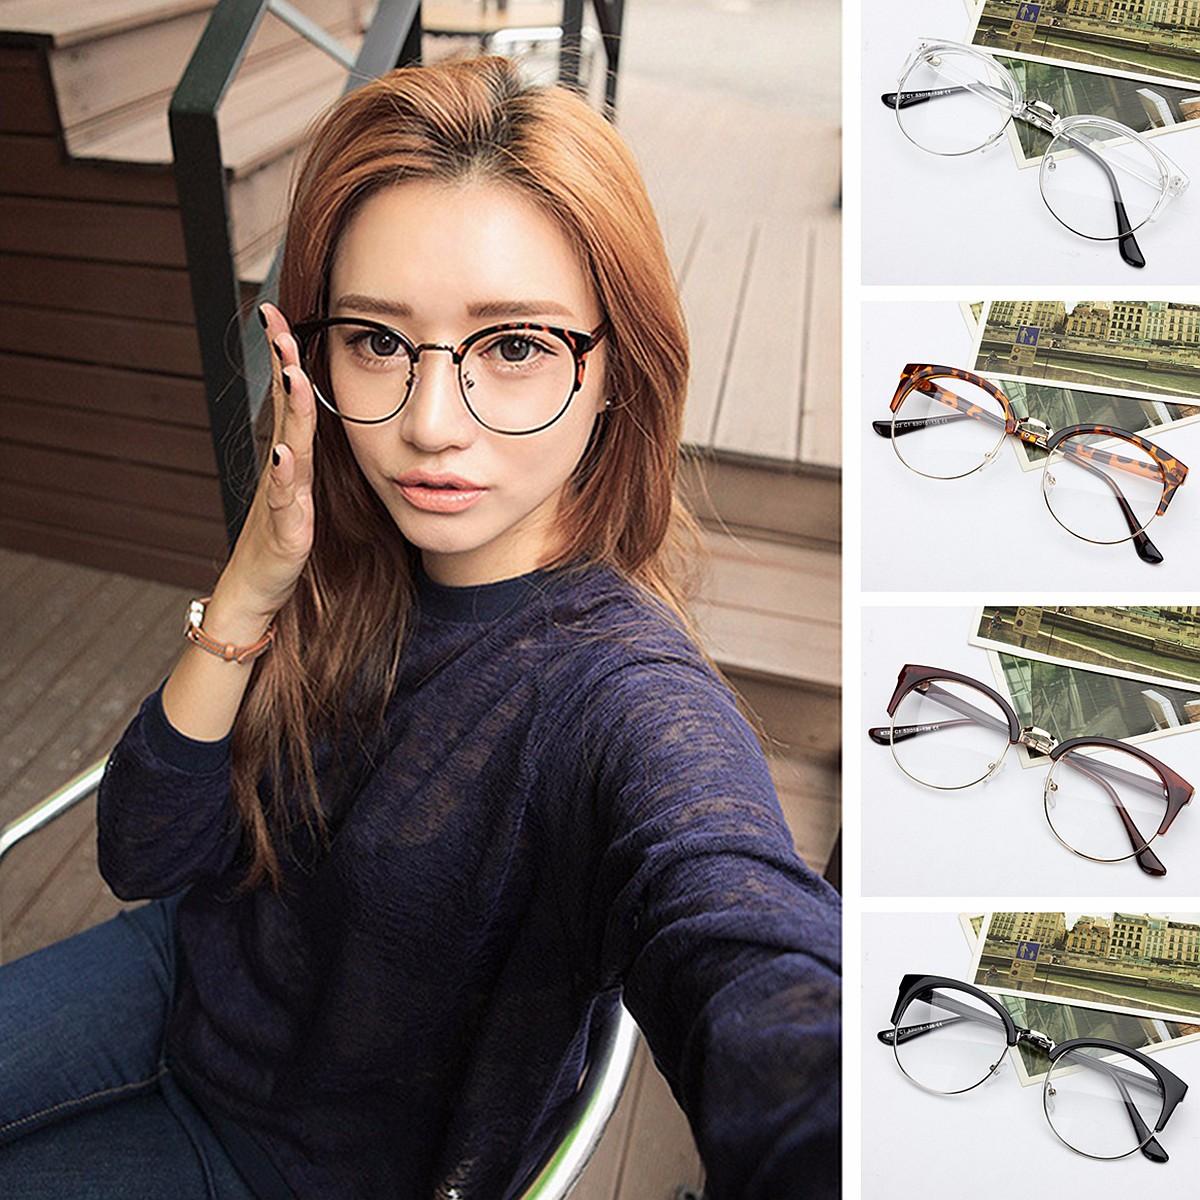 da0b0b648aad New Retro Style Women Men Round Nerd Clear Lens Eyewear Metal Frame ...